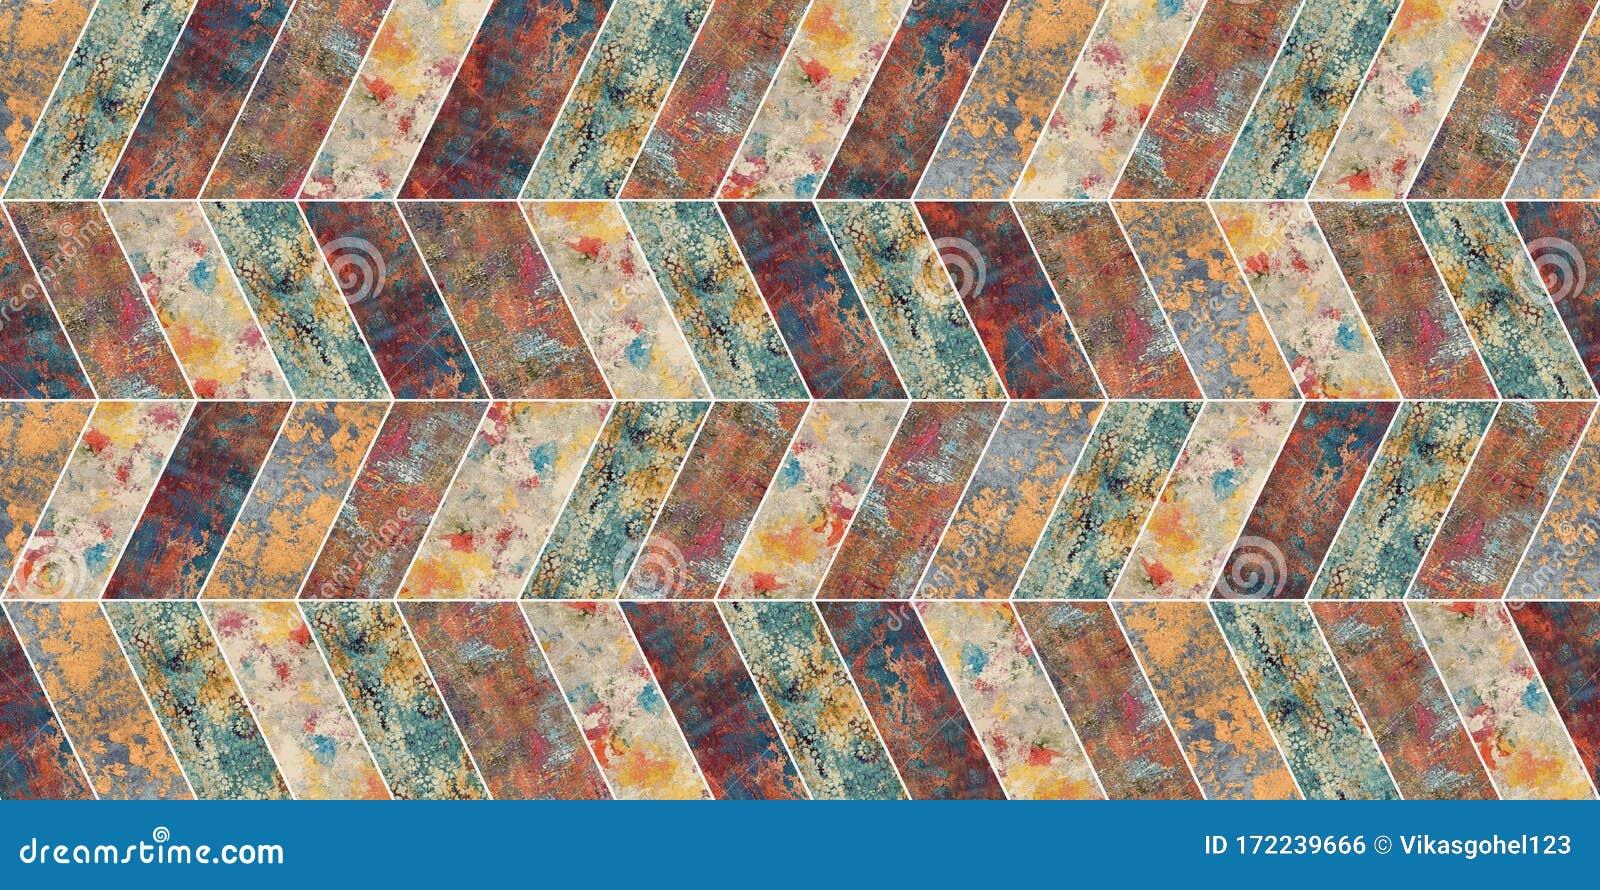 Colorful Vintage Ceramic Tiles Wall Decoration Portuguese Decorative Design Modern Bathroom And Living Room Design Structure Moro Stock Illustration Illustration Of Colorful Hand 172239666